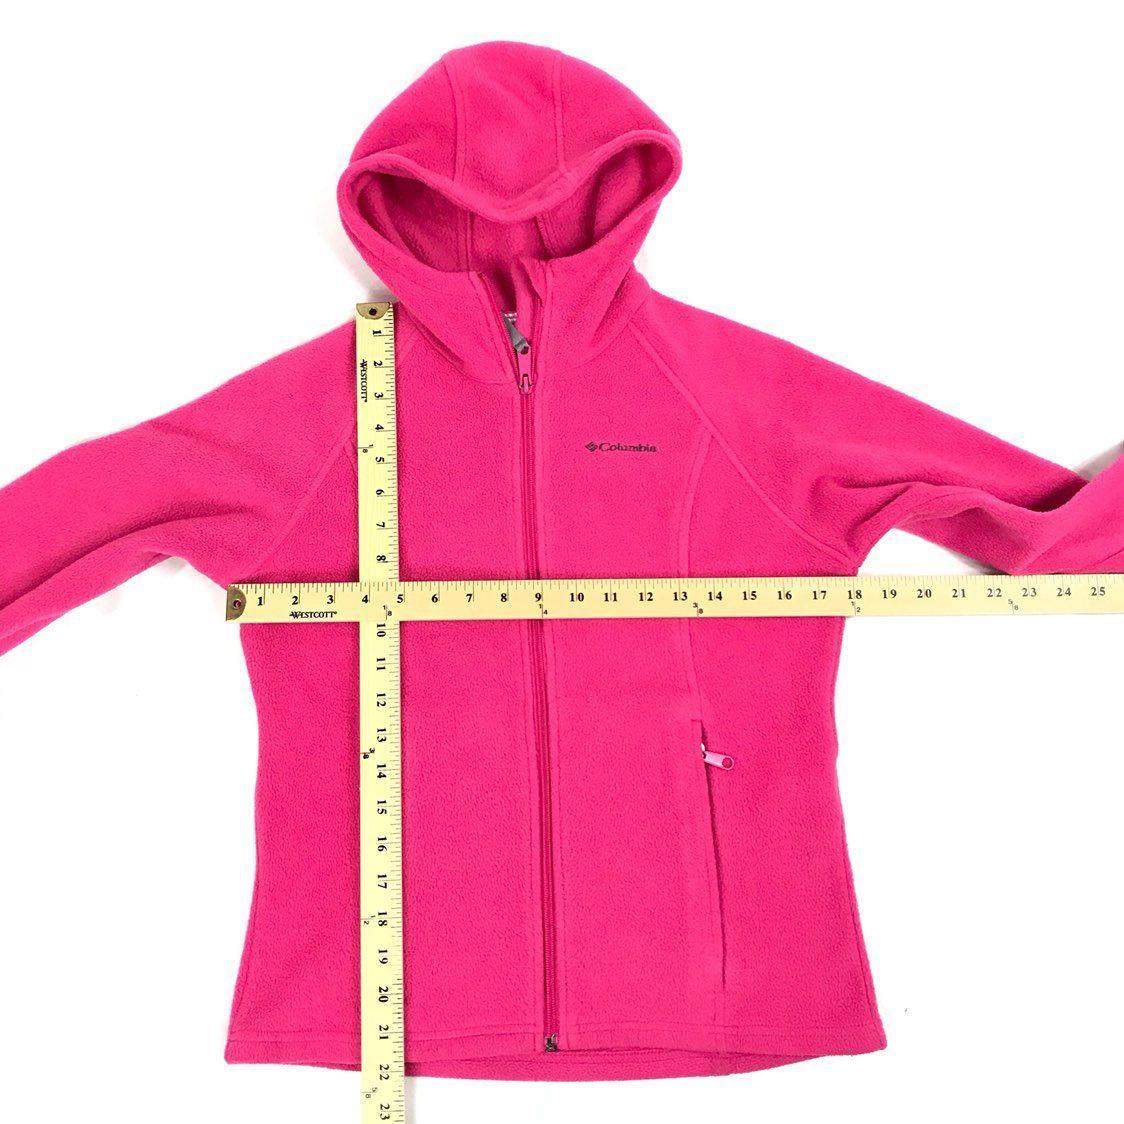 Columbia Pink Hooded Fleece Sweater L/S - Mercari: BUY & SELL ...